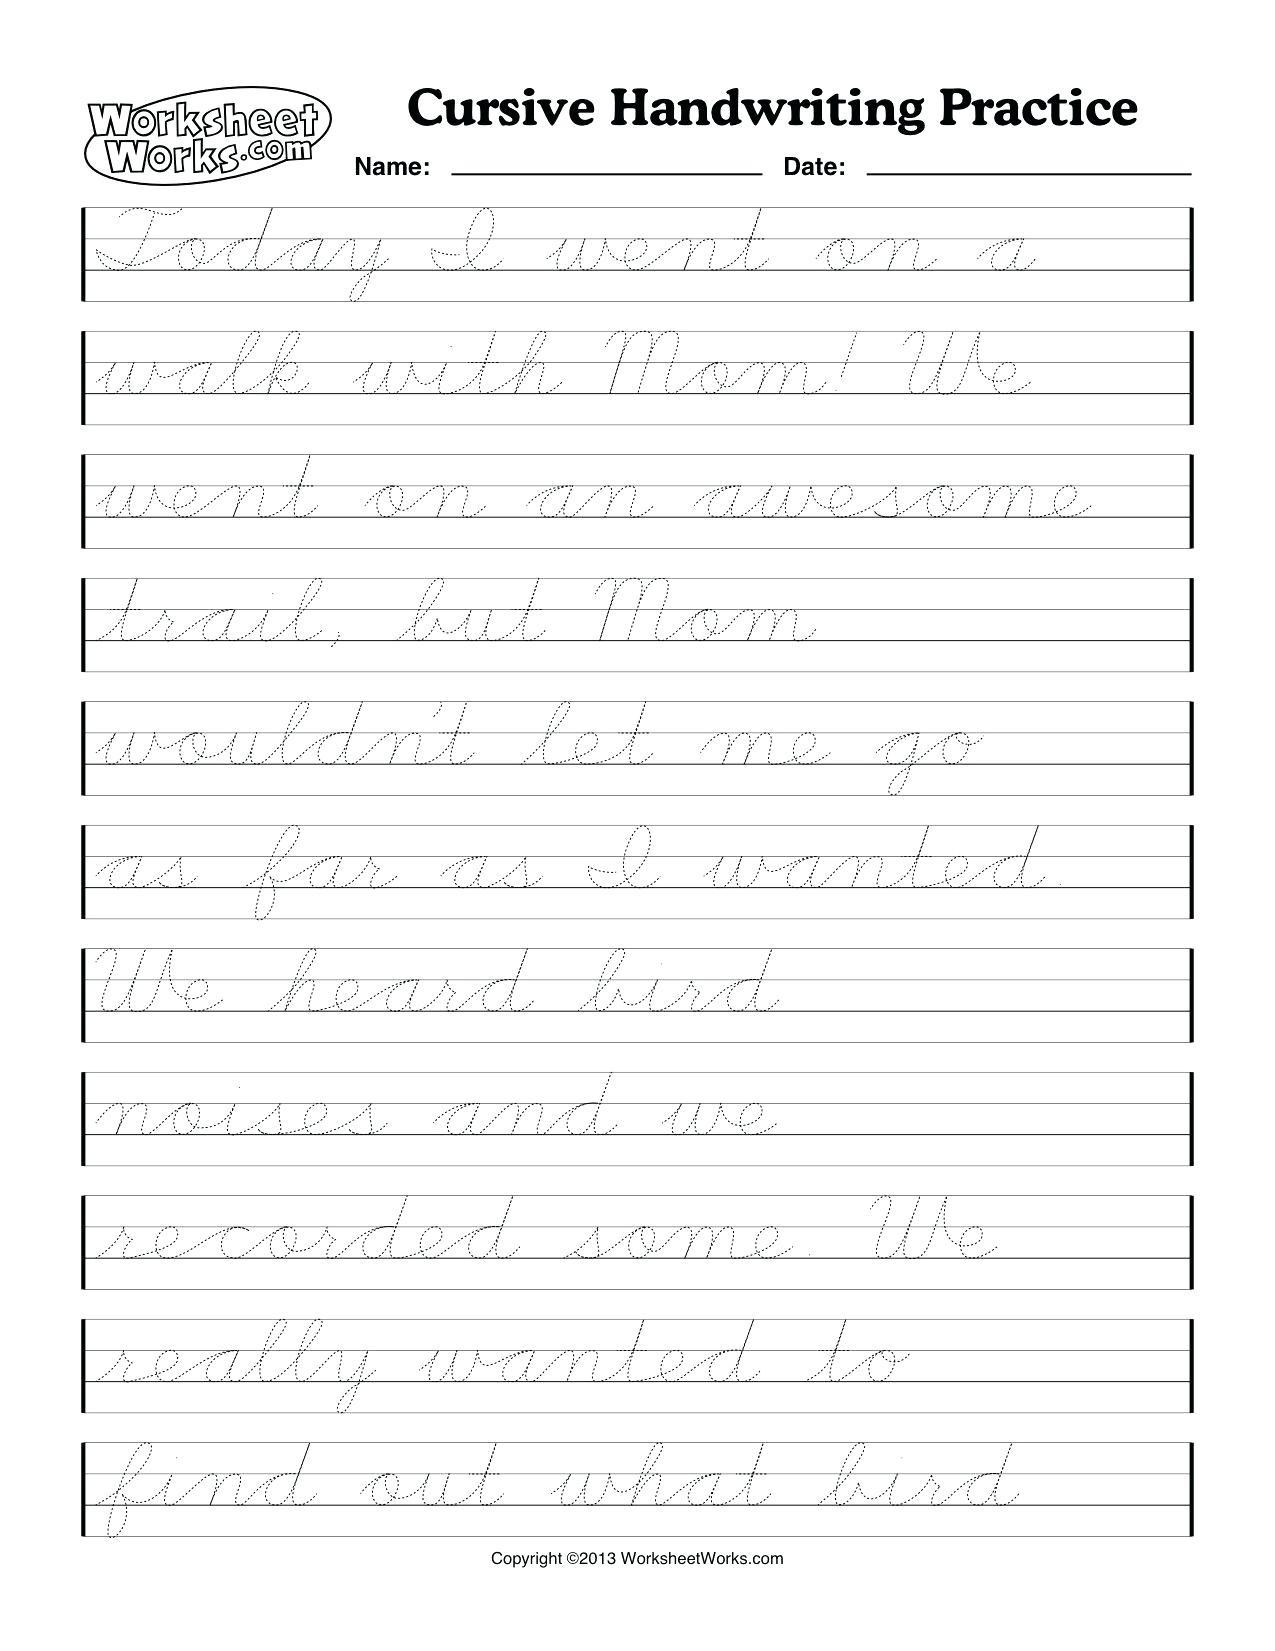 Printable Cursive Name Sheets Cursive Name Worksheets Cursive - Free | Handwriting Names Printable Worksheets